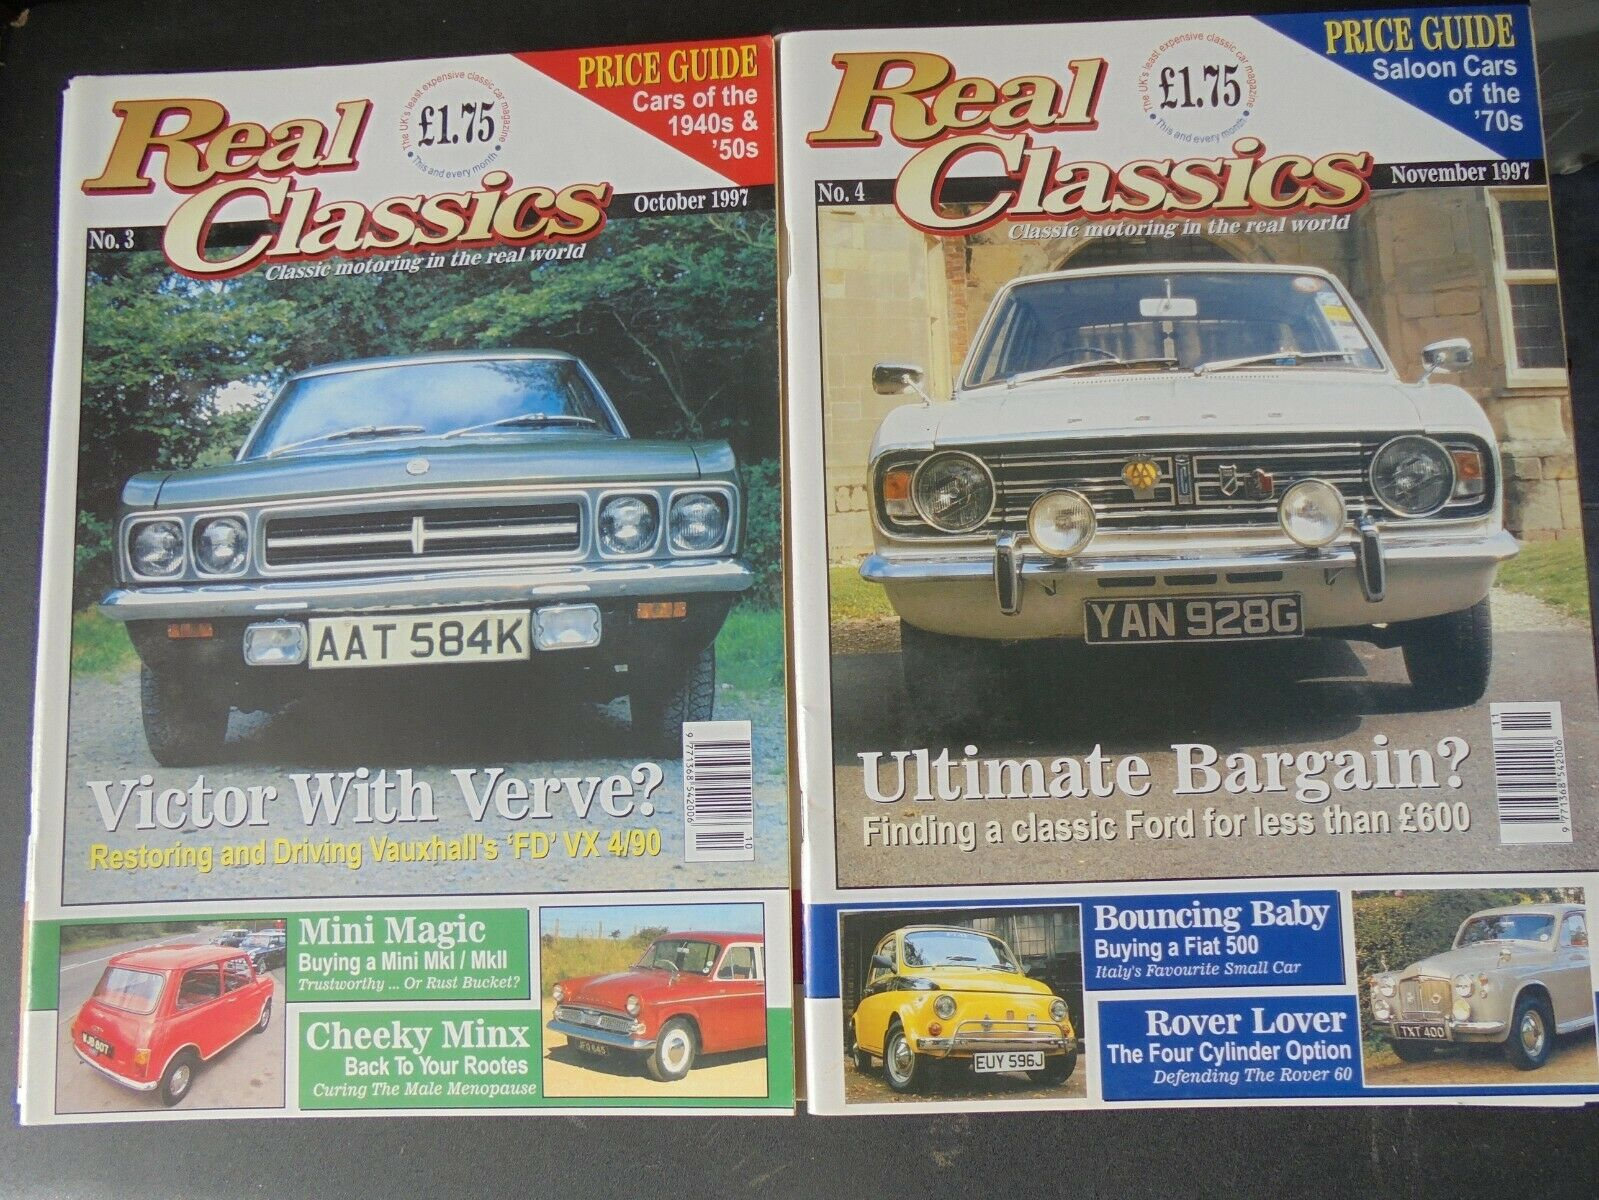 Real Classics 3 & 4.jpg